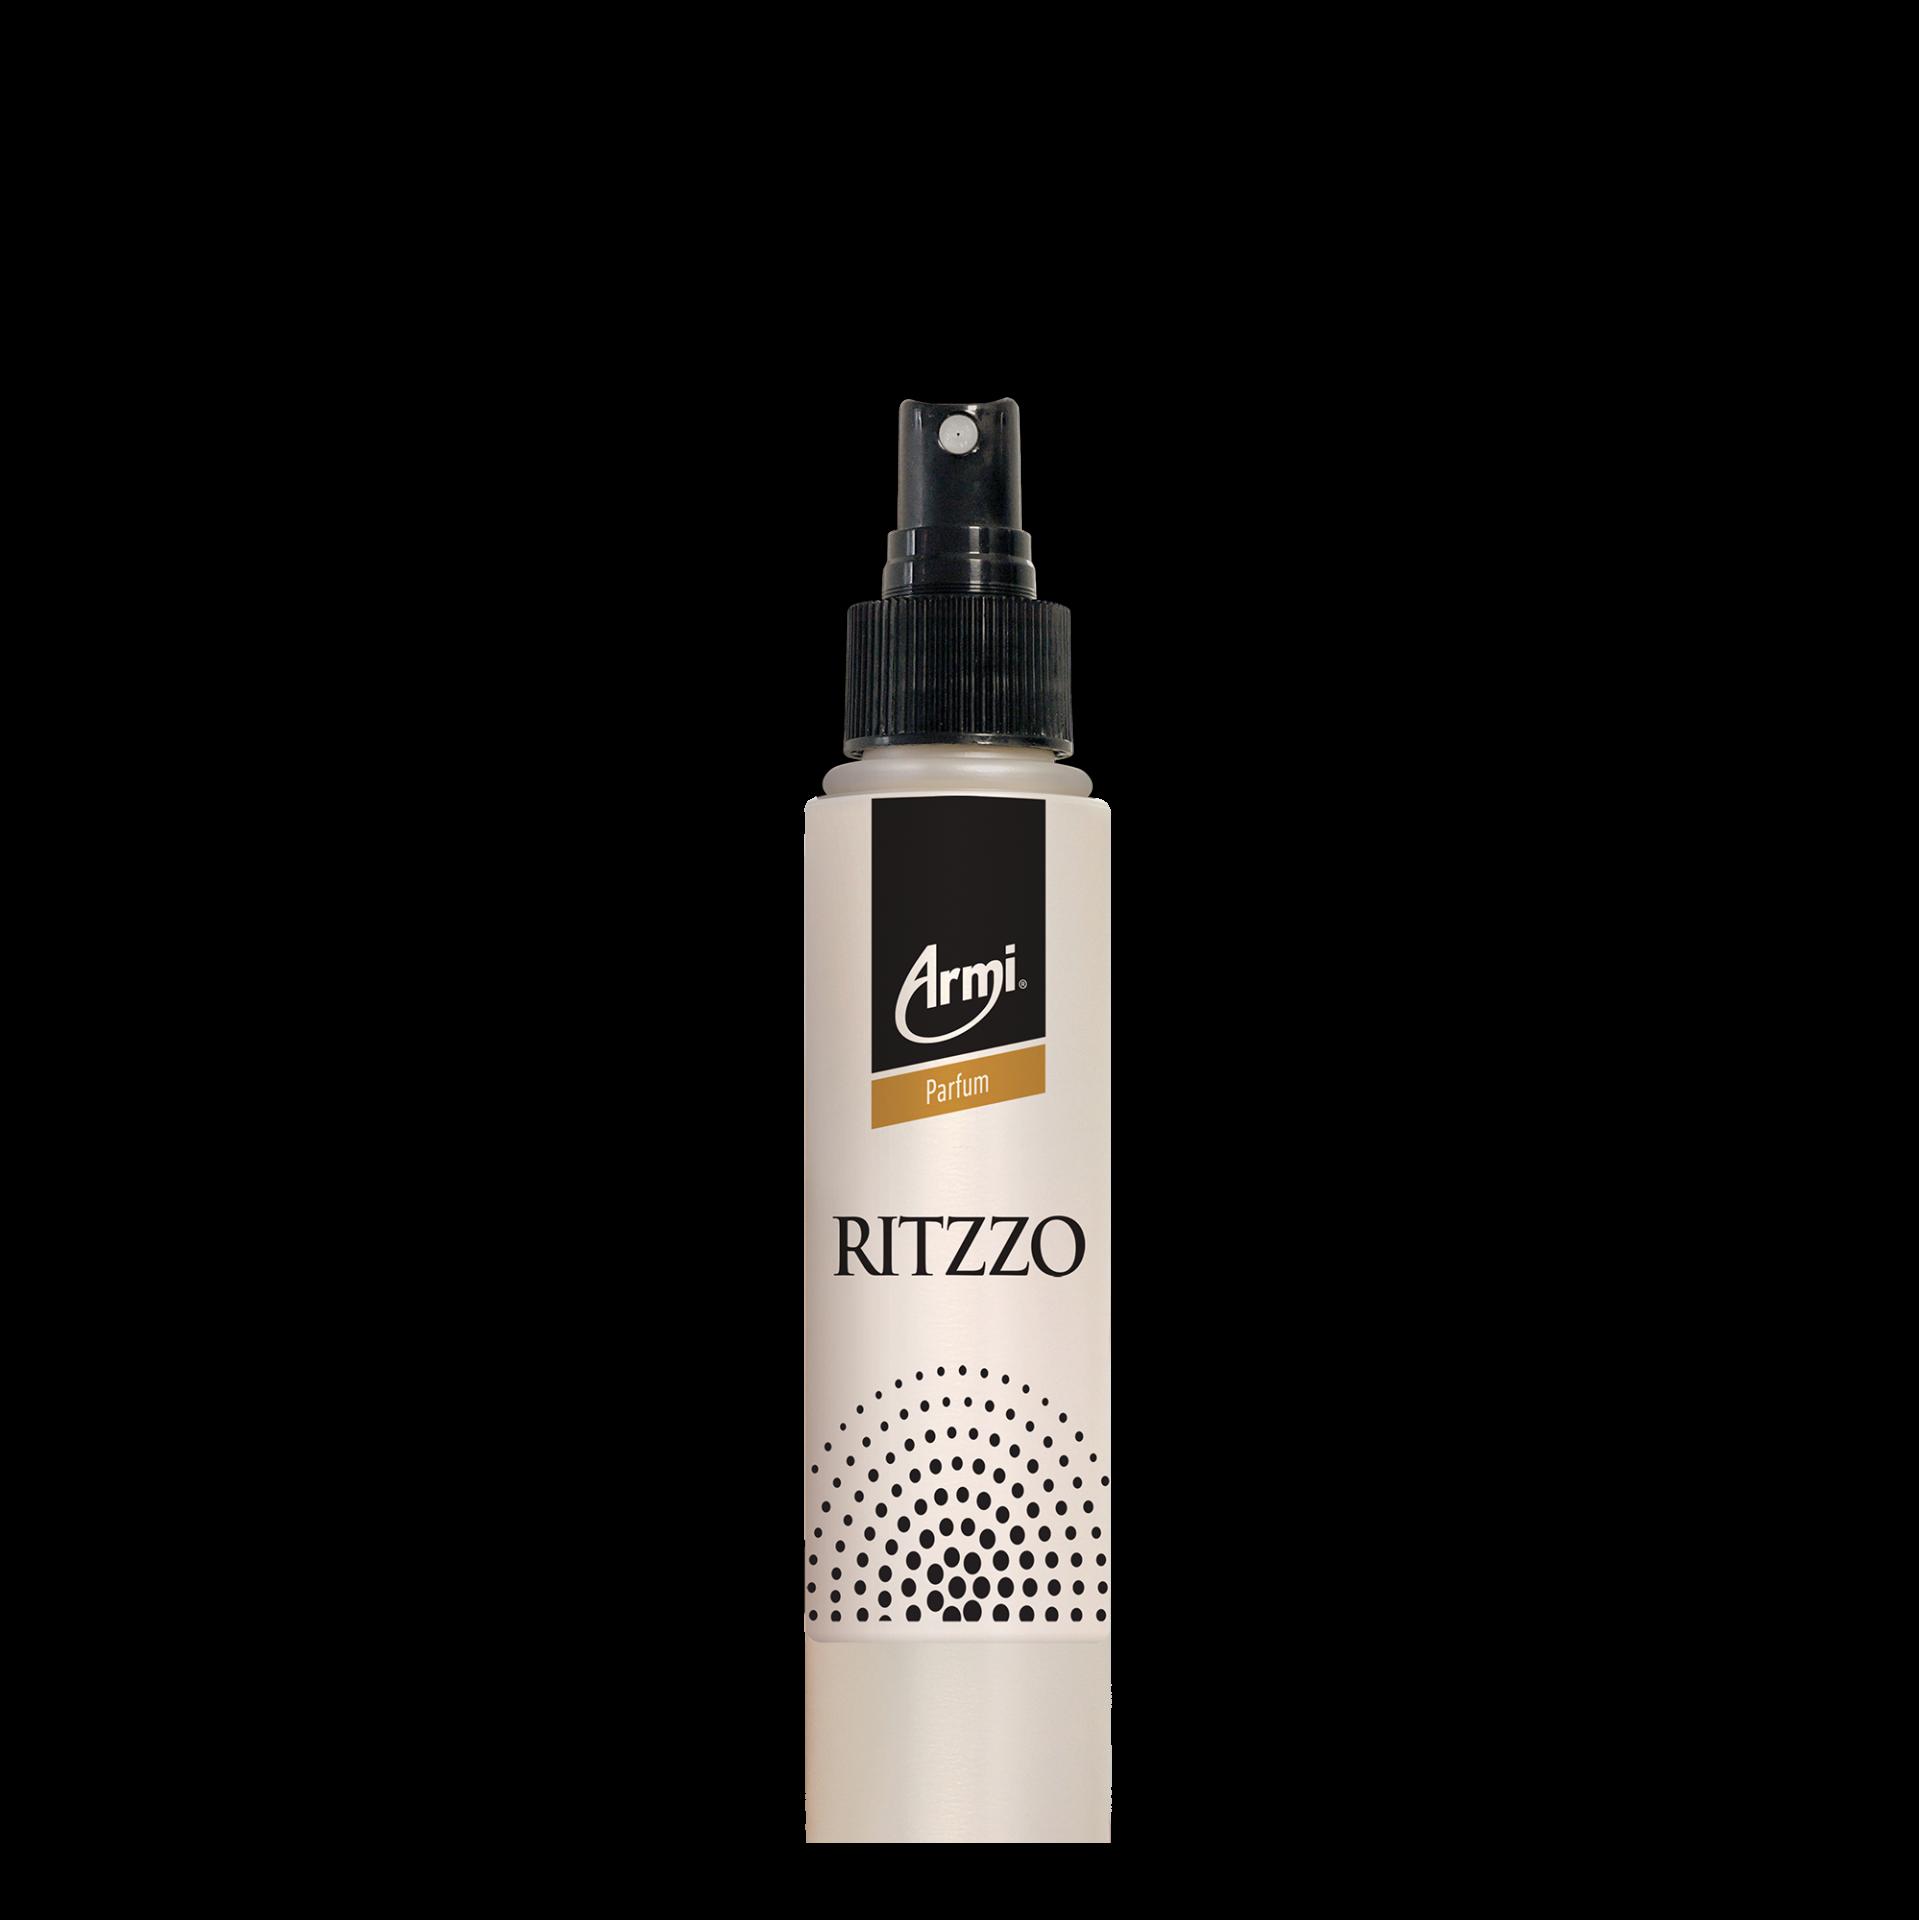 Perfume Ritzzo de Armi